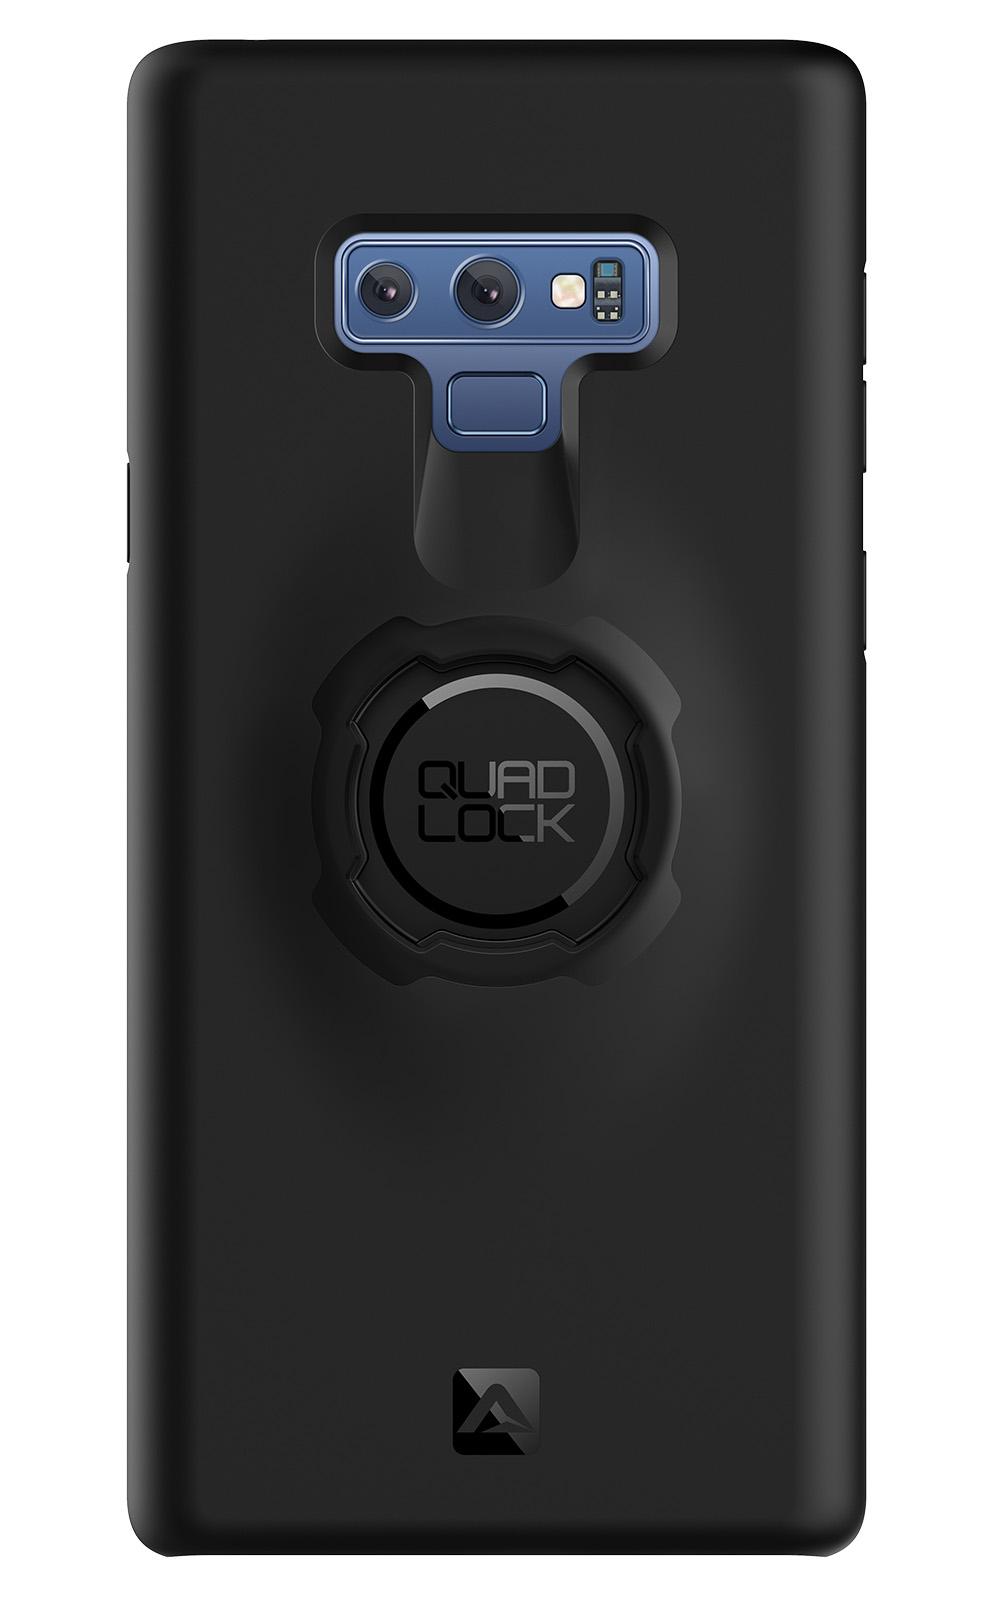 Quad Lock kryt mobilného telefónu Casa - Samsung Galaxy Note 9